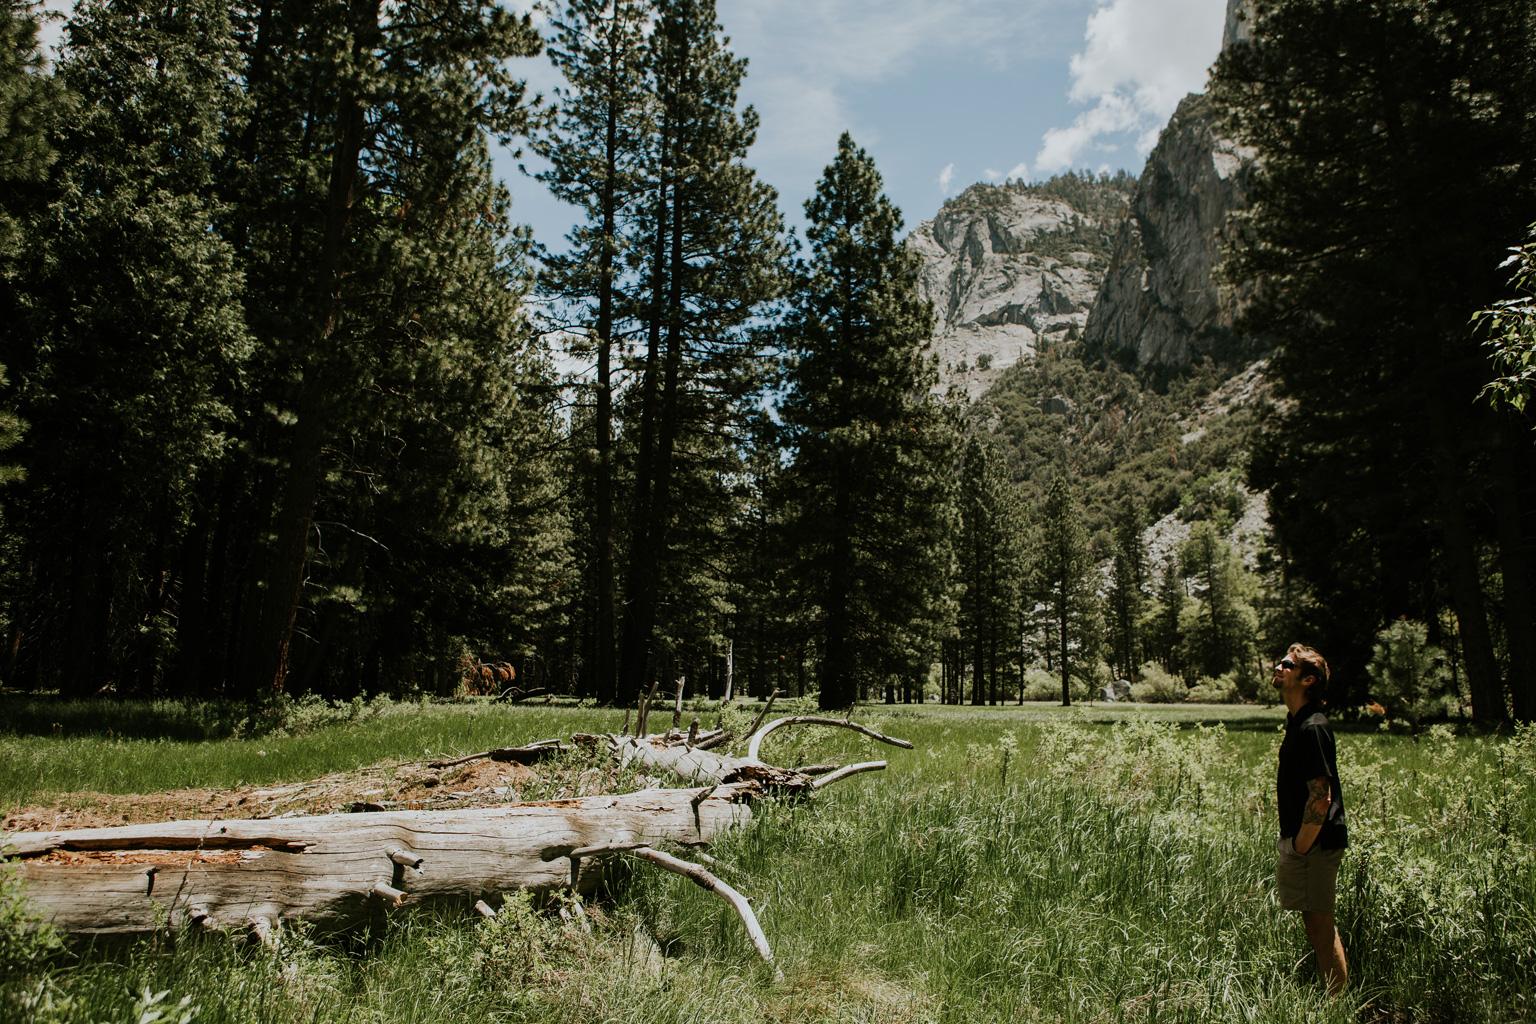 CindyGiovagnoli_Sequoia_Kings_Canyon_National_Park_California_bear_camping_roadtrip_travel-008.jpg